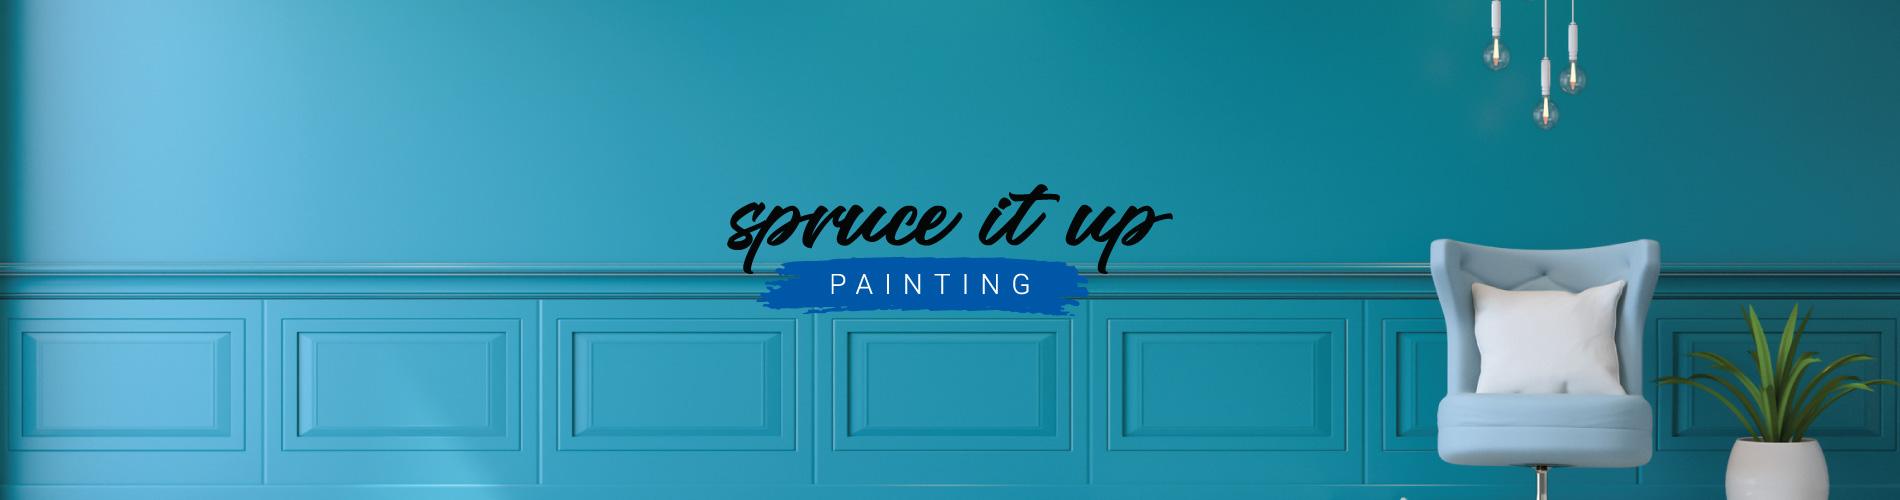 Industrial Painters   Painters Gold Coast & Brisbane   0435 767 723